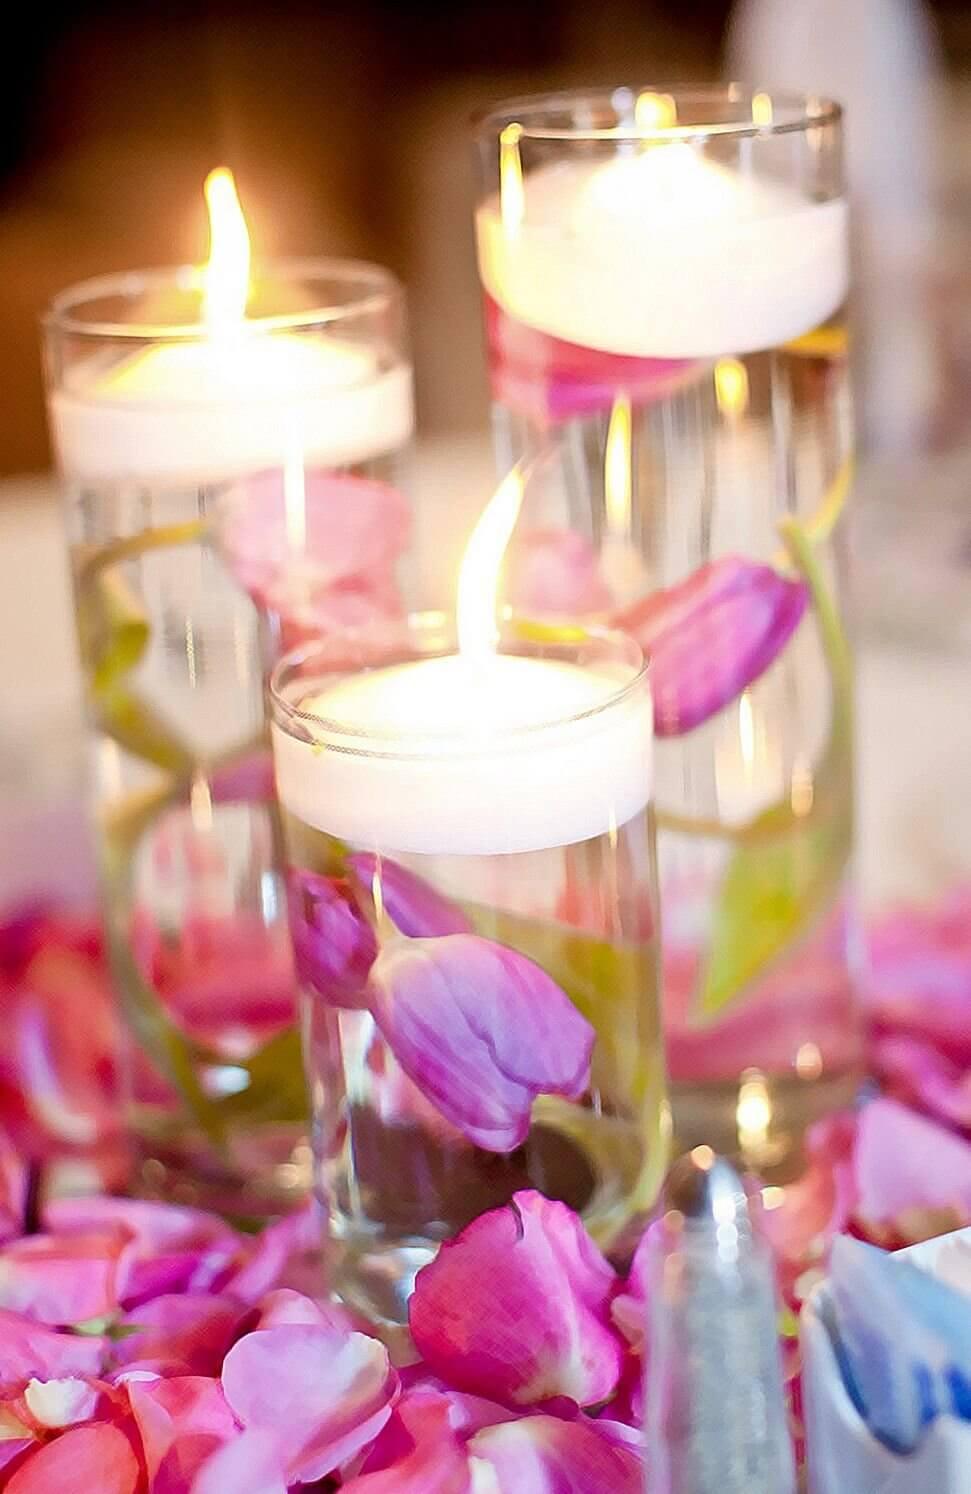 Cylinder Wedding Centerpieces Make These Easy Cylinder Centerpieces